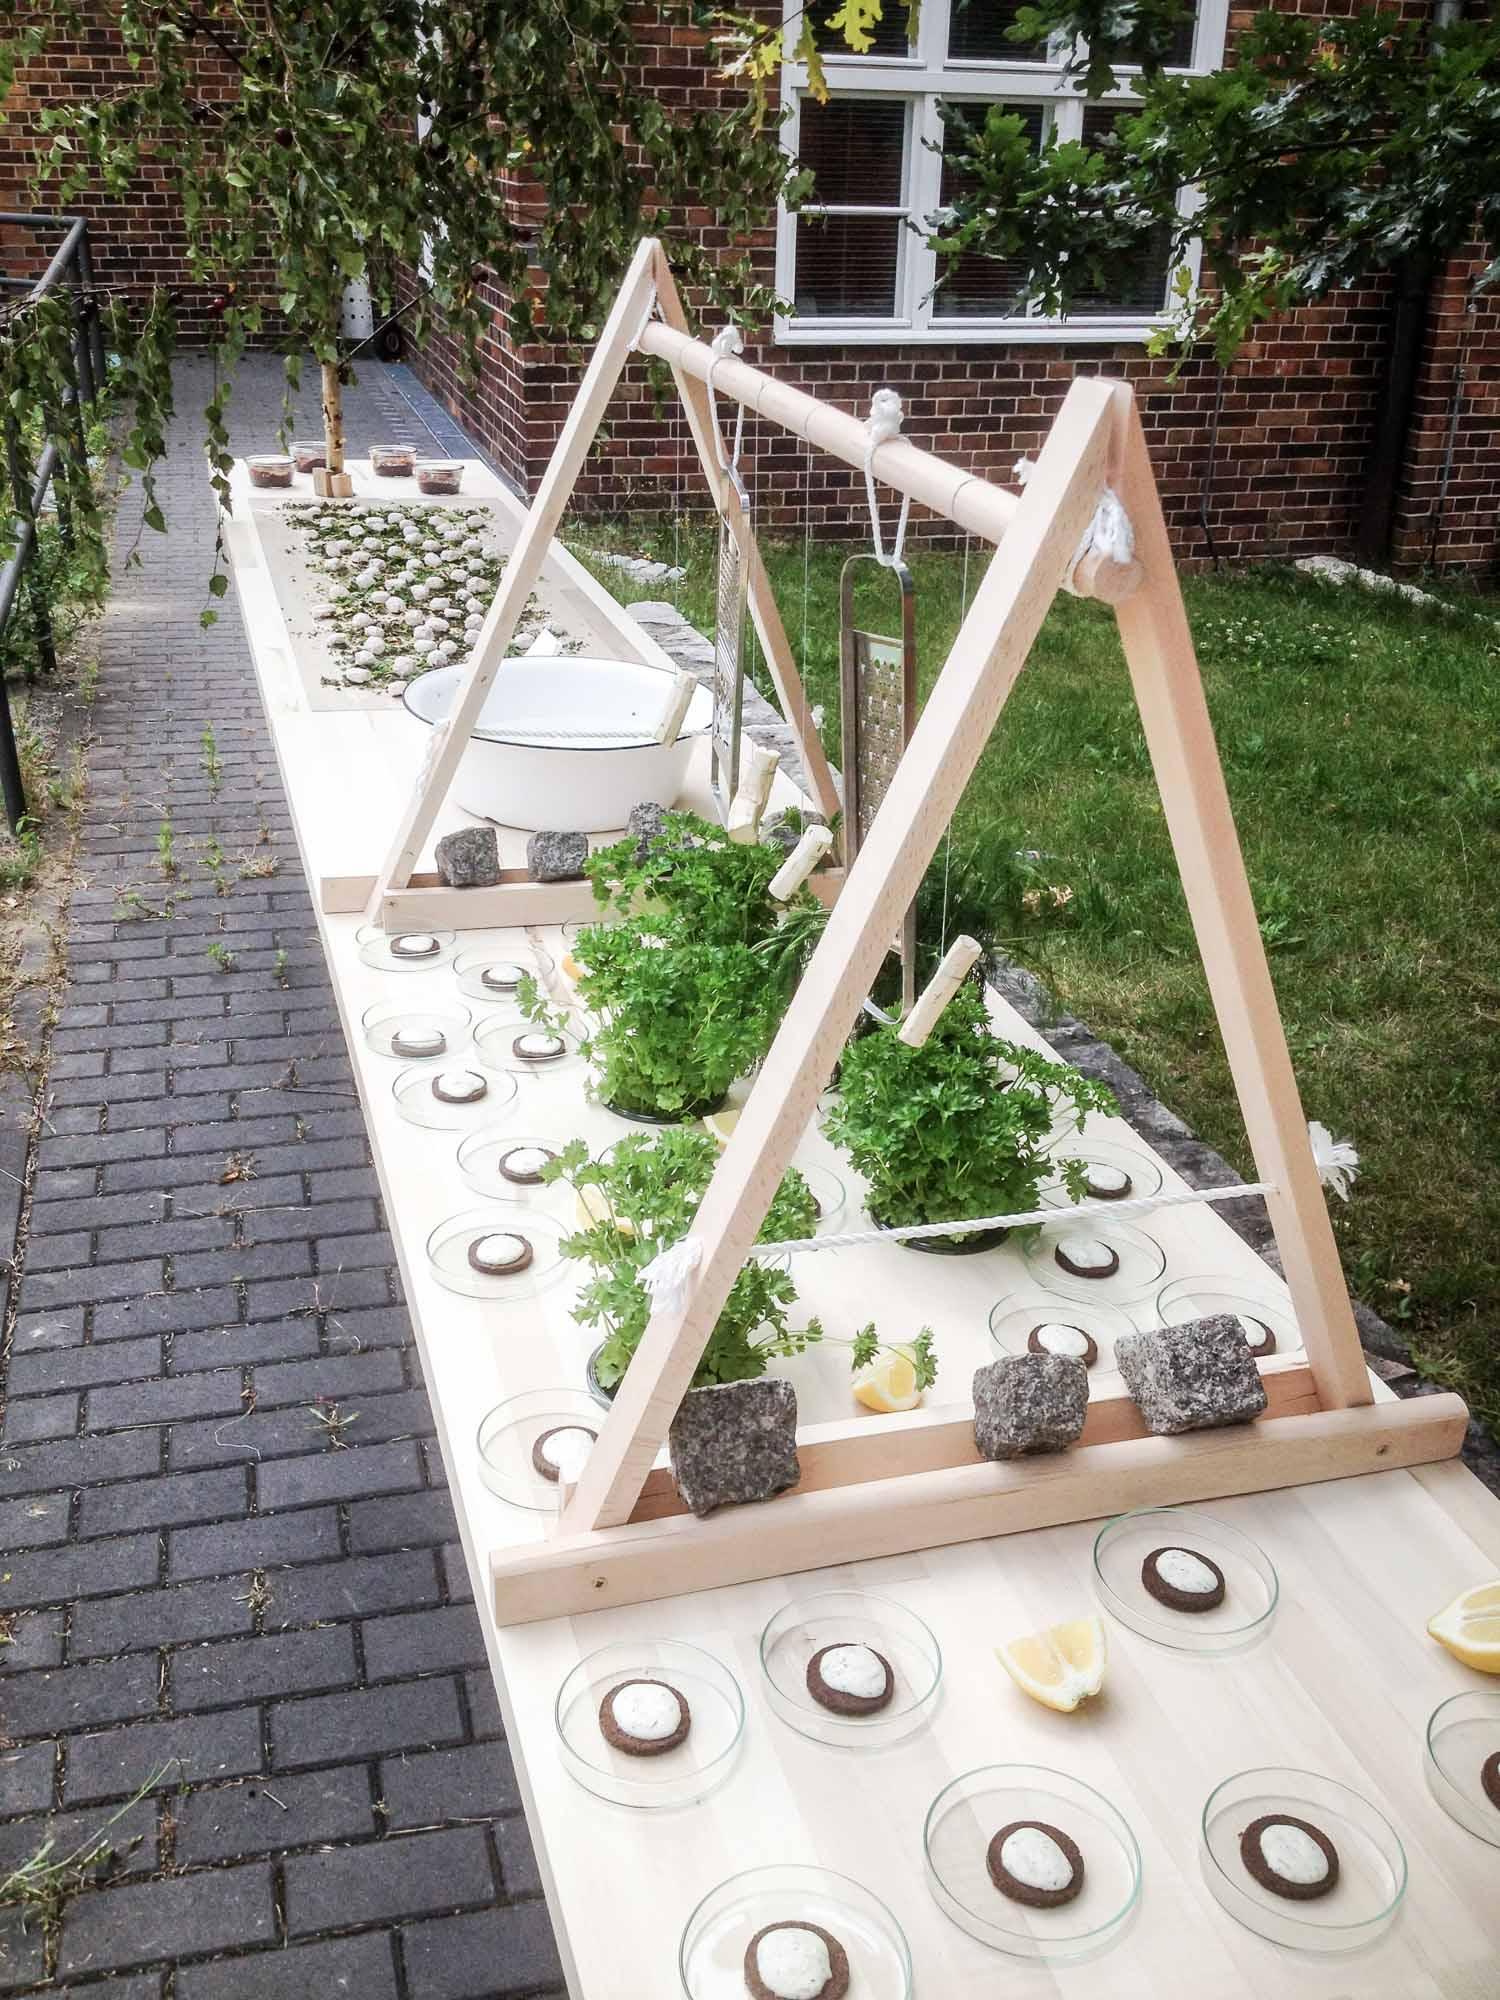 Wild and Root design thinking Food Studio Berlin